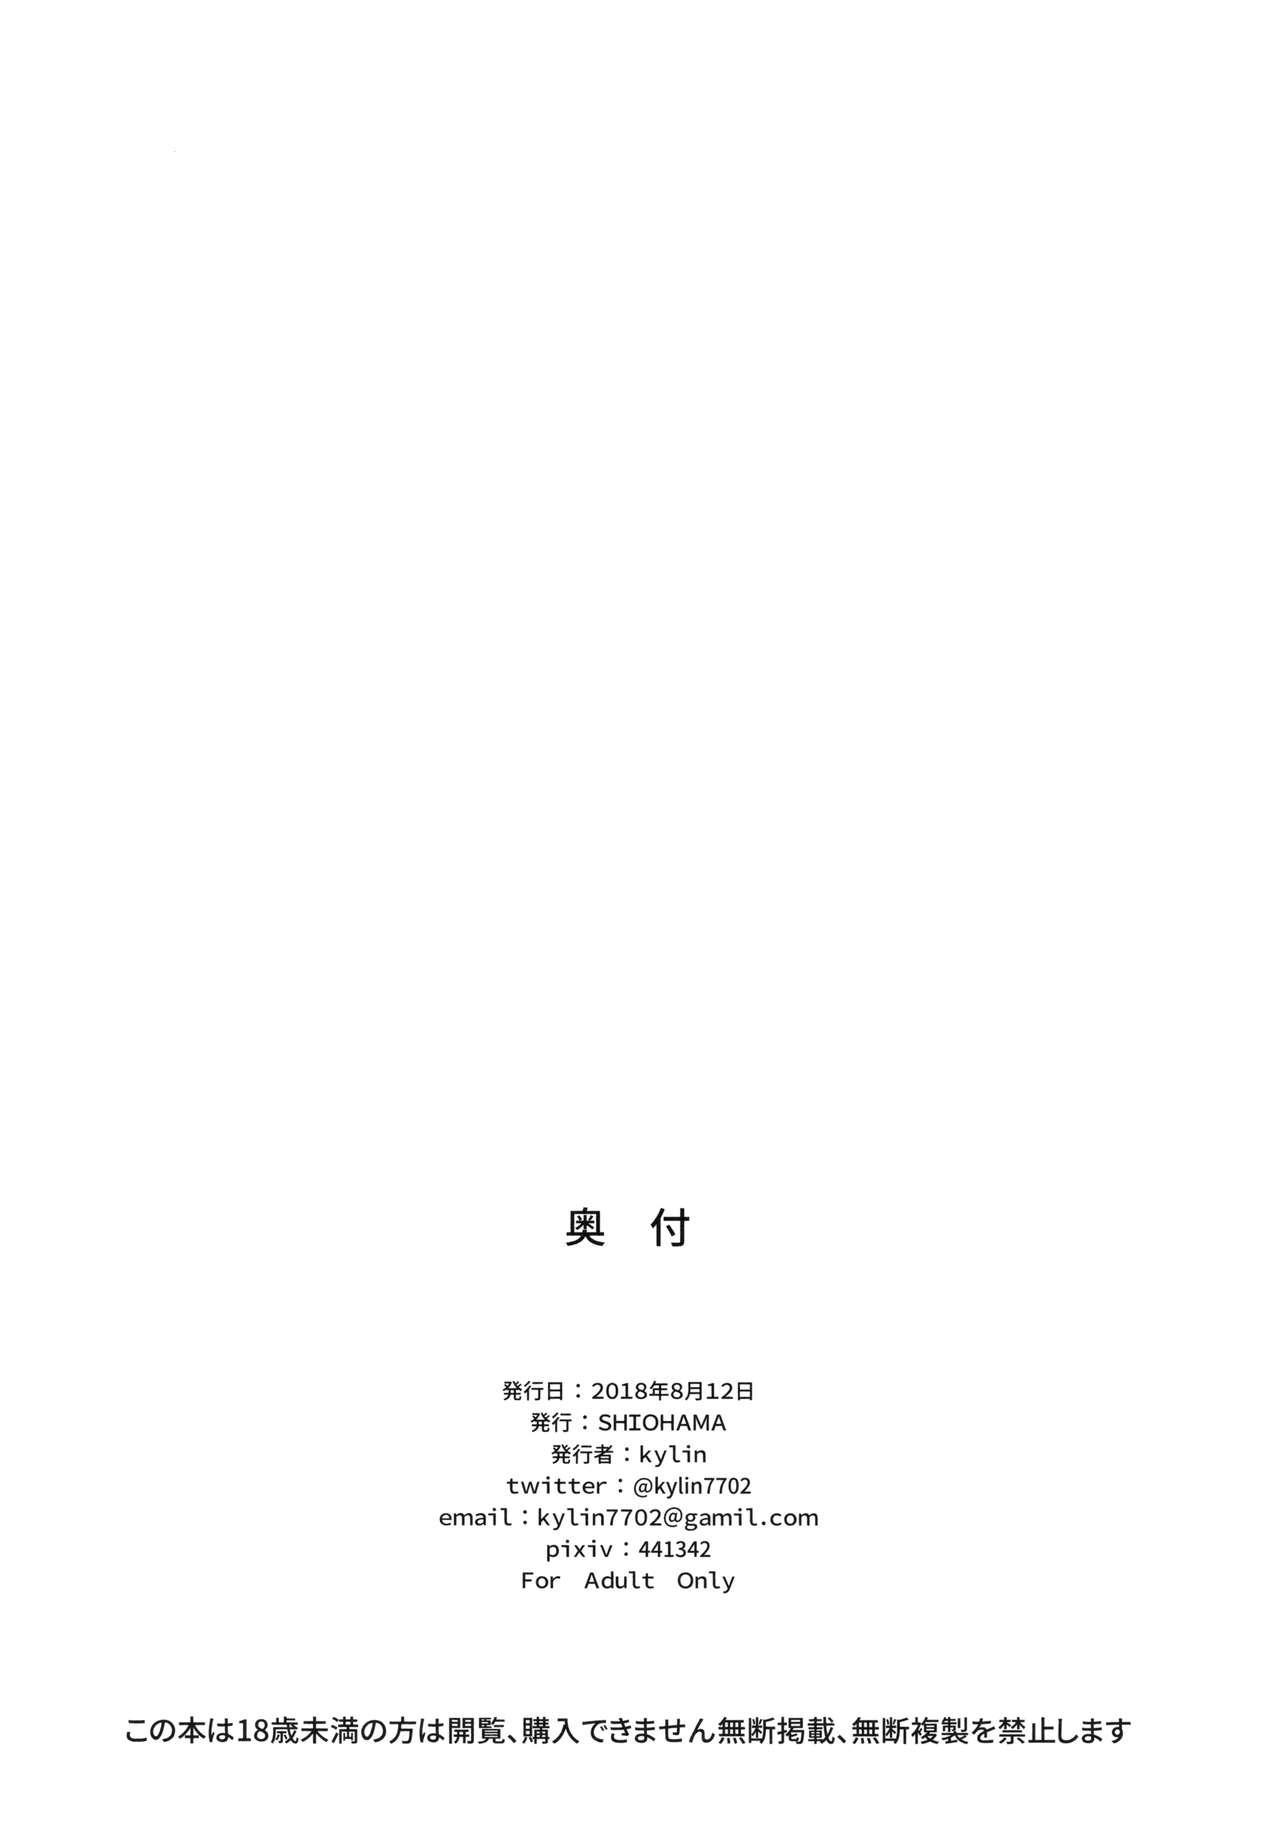 (C94) [SHIOHAMA (kylin)] Onanie Chuudoku Arisu-chan | Masturbation Addict Arisu-chan (Girls und Panzer) [English] [Burger] 22